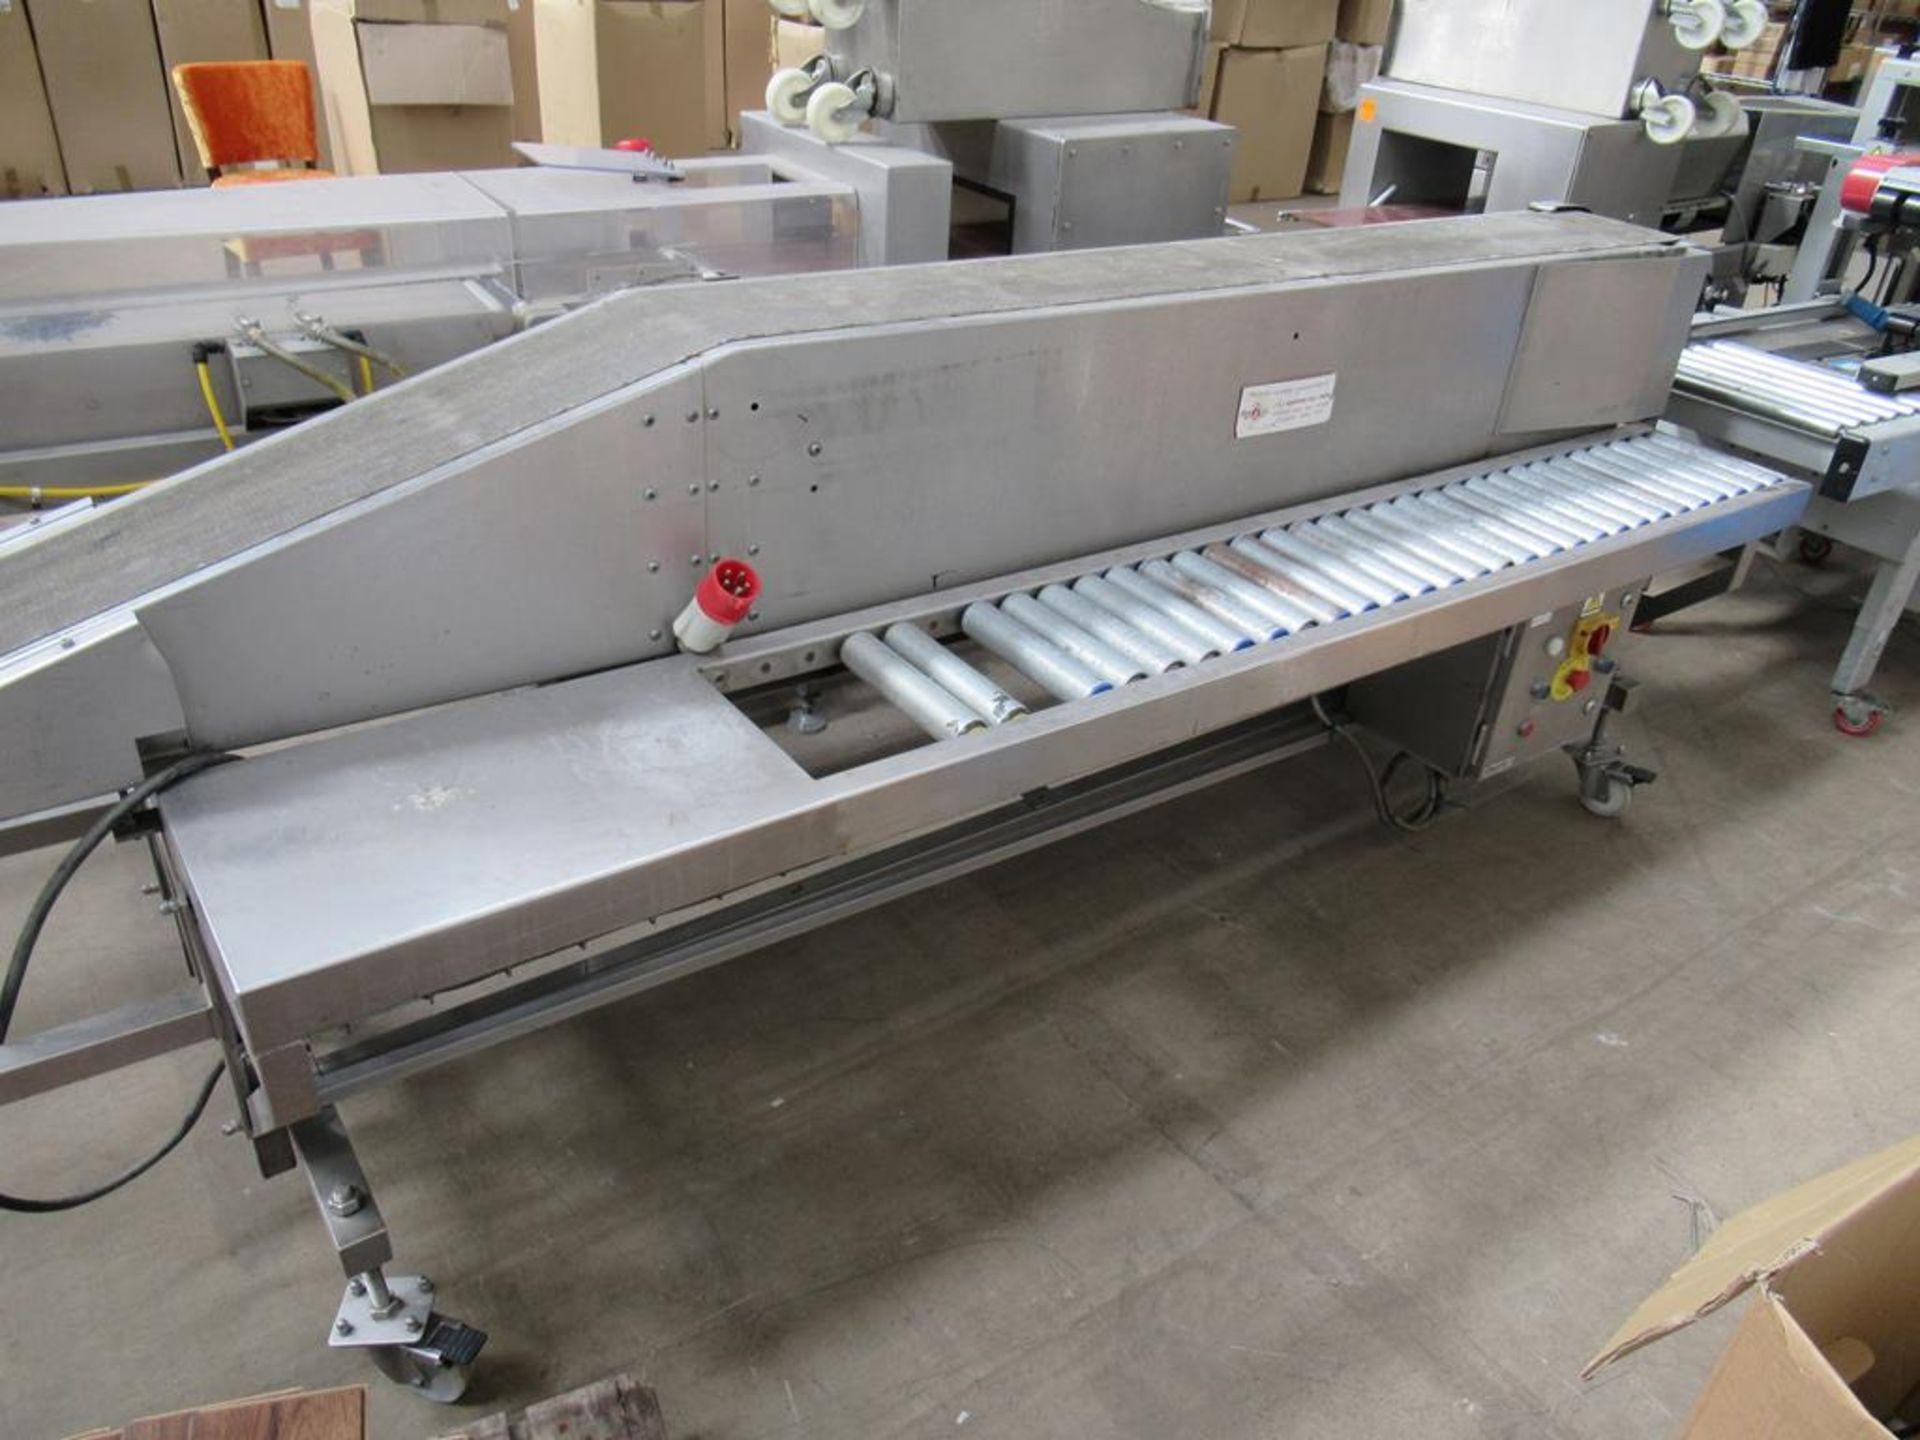 Unbranded Packing Conveyor on Castor Wheels - Image 2 of 4